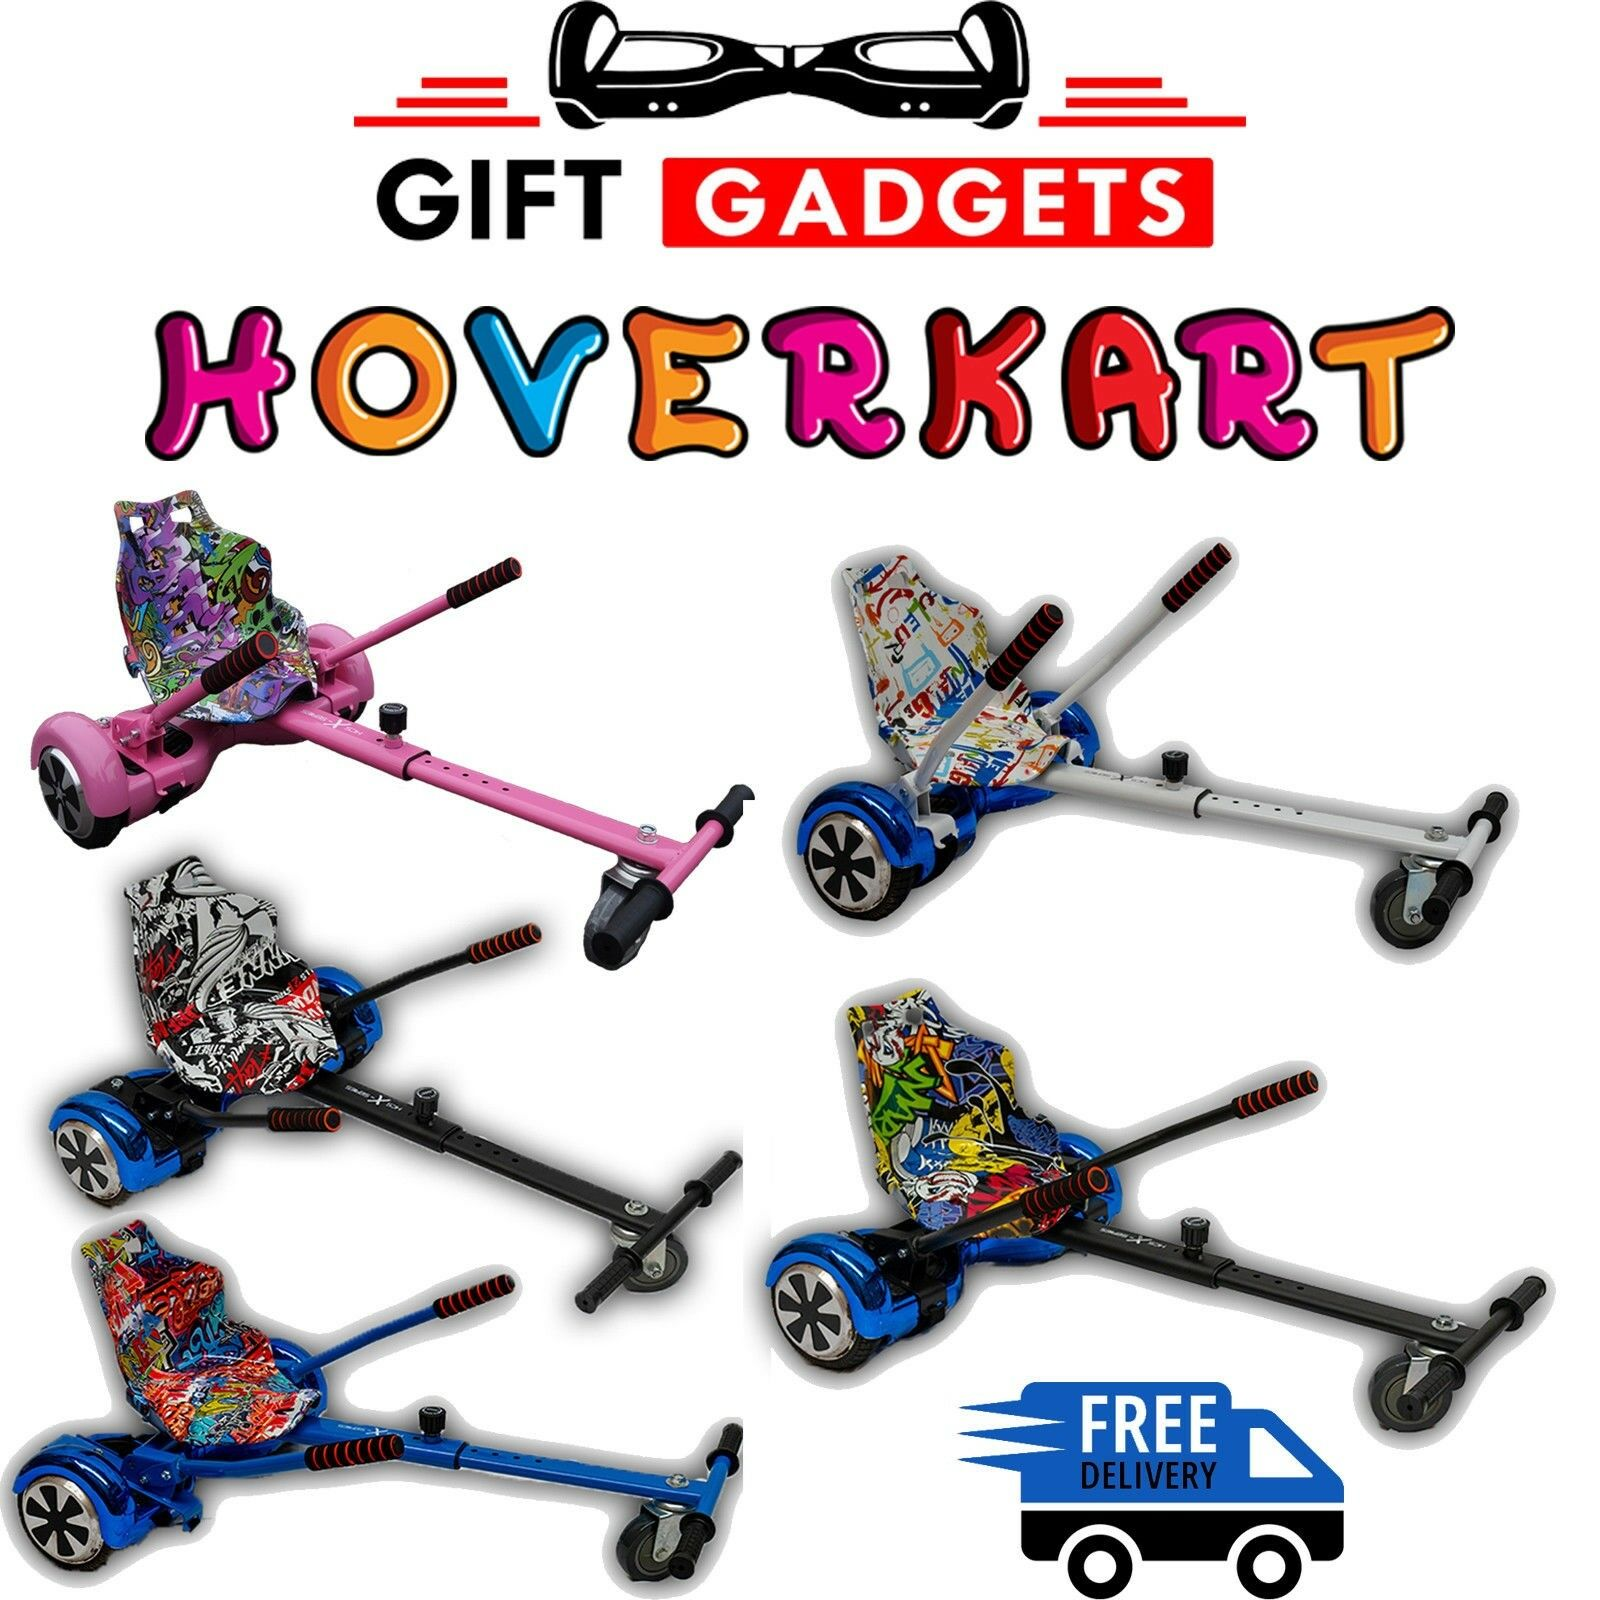 Kids Racer Hover Kart GoKart For Self Balancing Board